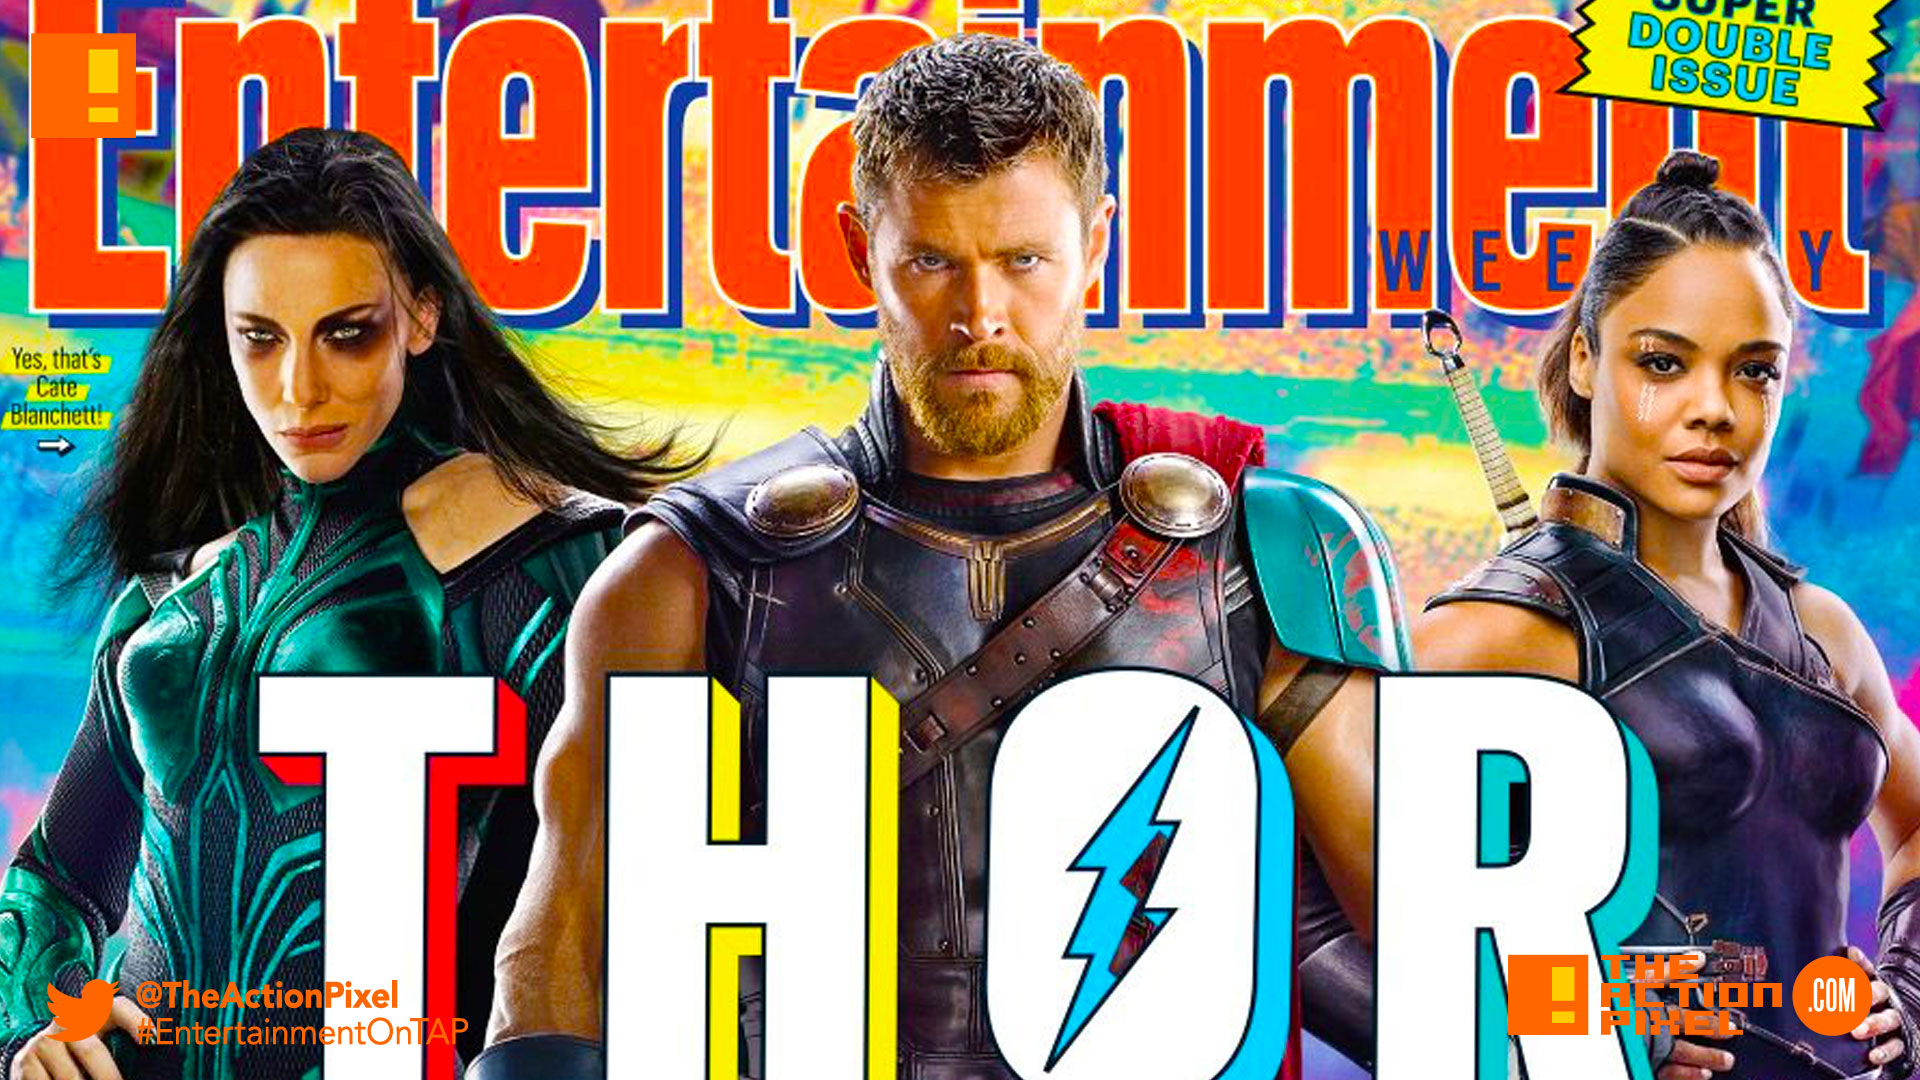 thor, thor: ragnarok, thor ragnarok, marvel, marvel studios, marvel comics, chris hemsworth, the action pixel, entertainment on tap§